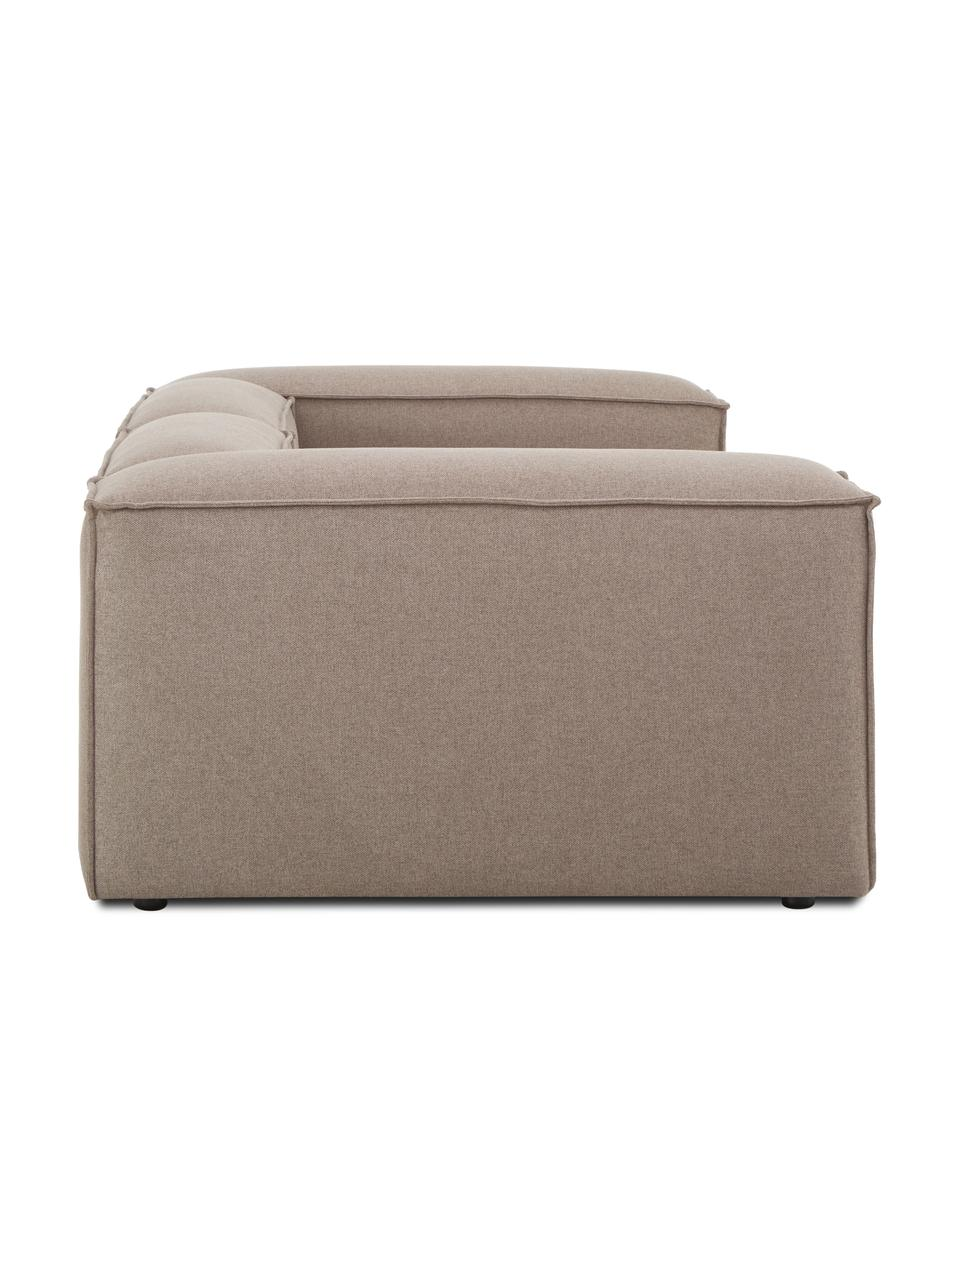 Canapé modulable 3 places tissu brun Lennon, Tissu brun